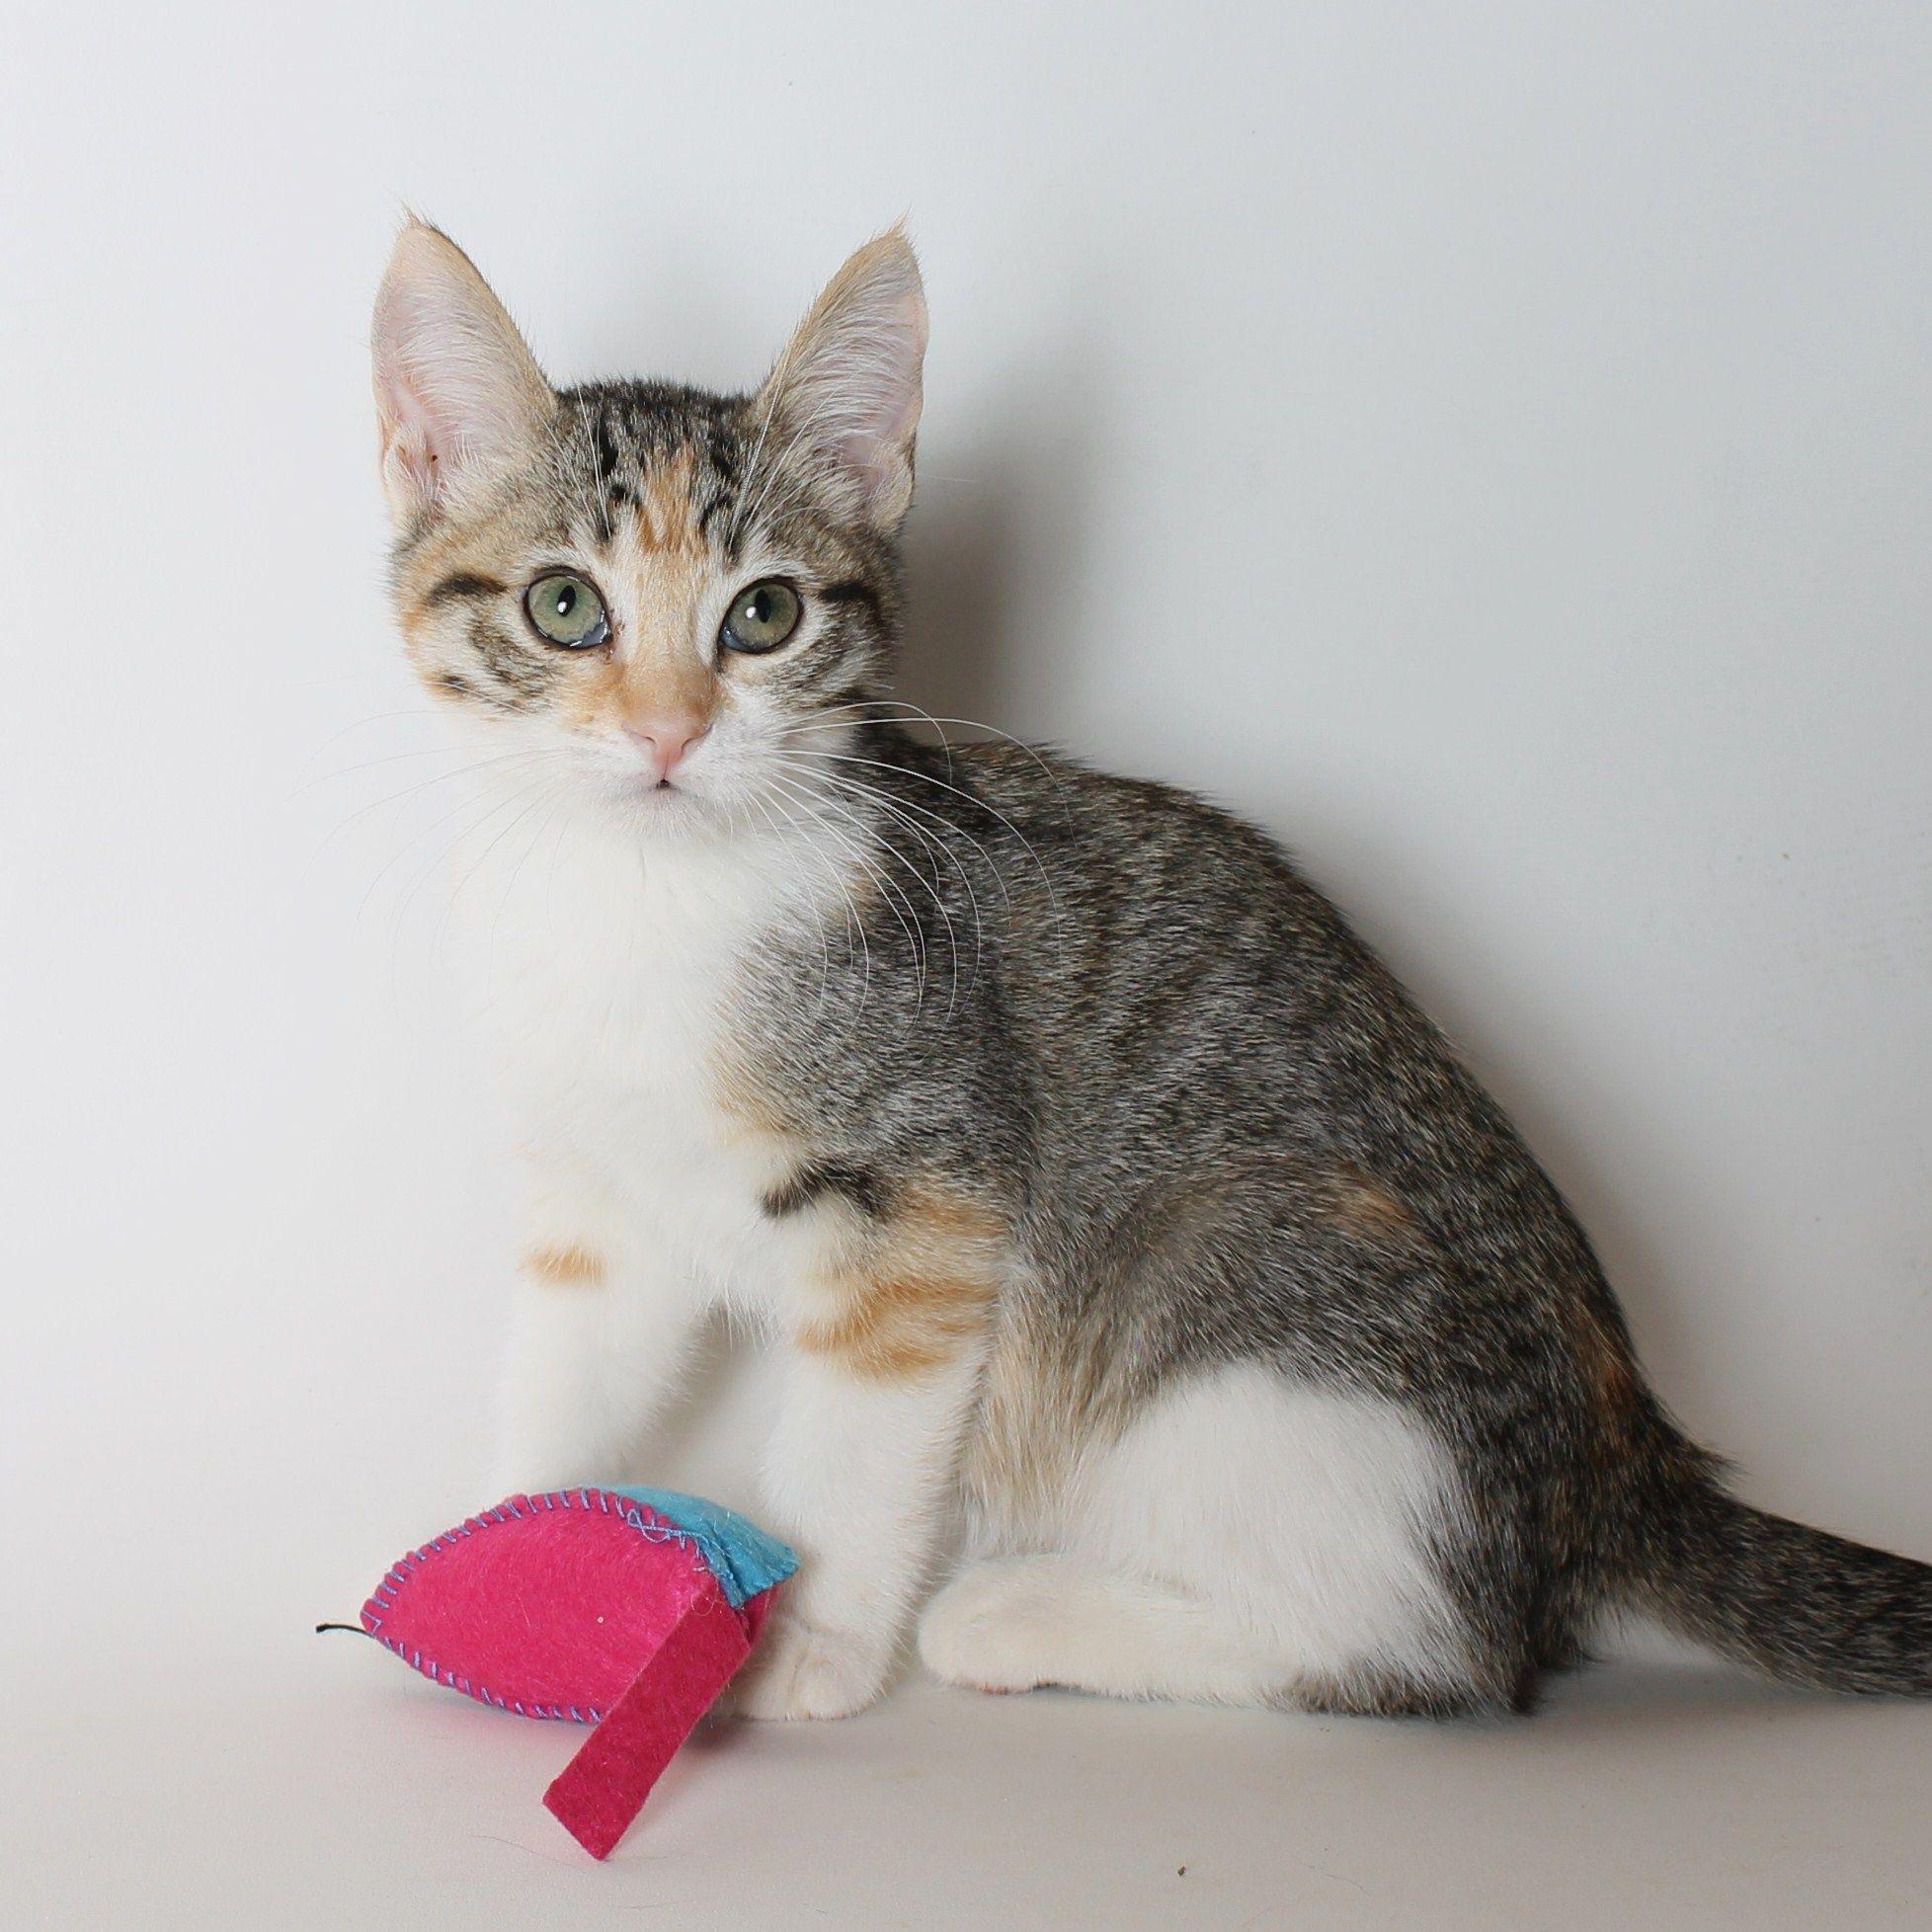 Princess Leah Kitten At Living Free Adoptme Animal Sanctuary Pet Adoption Animals